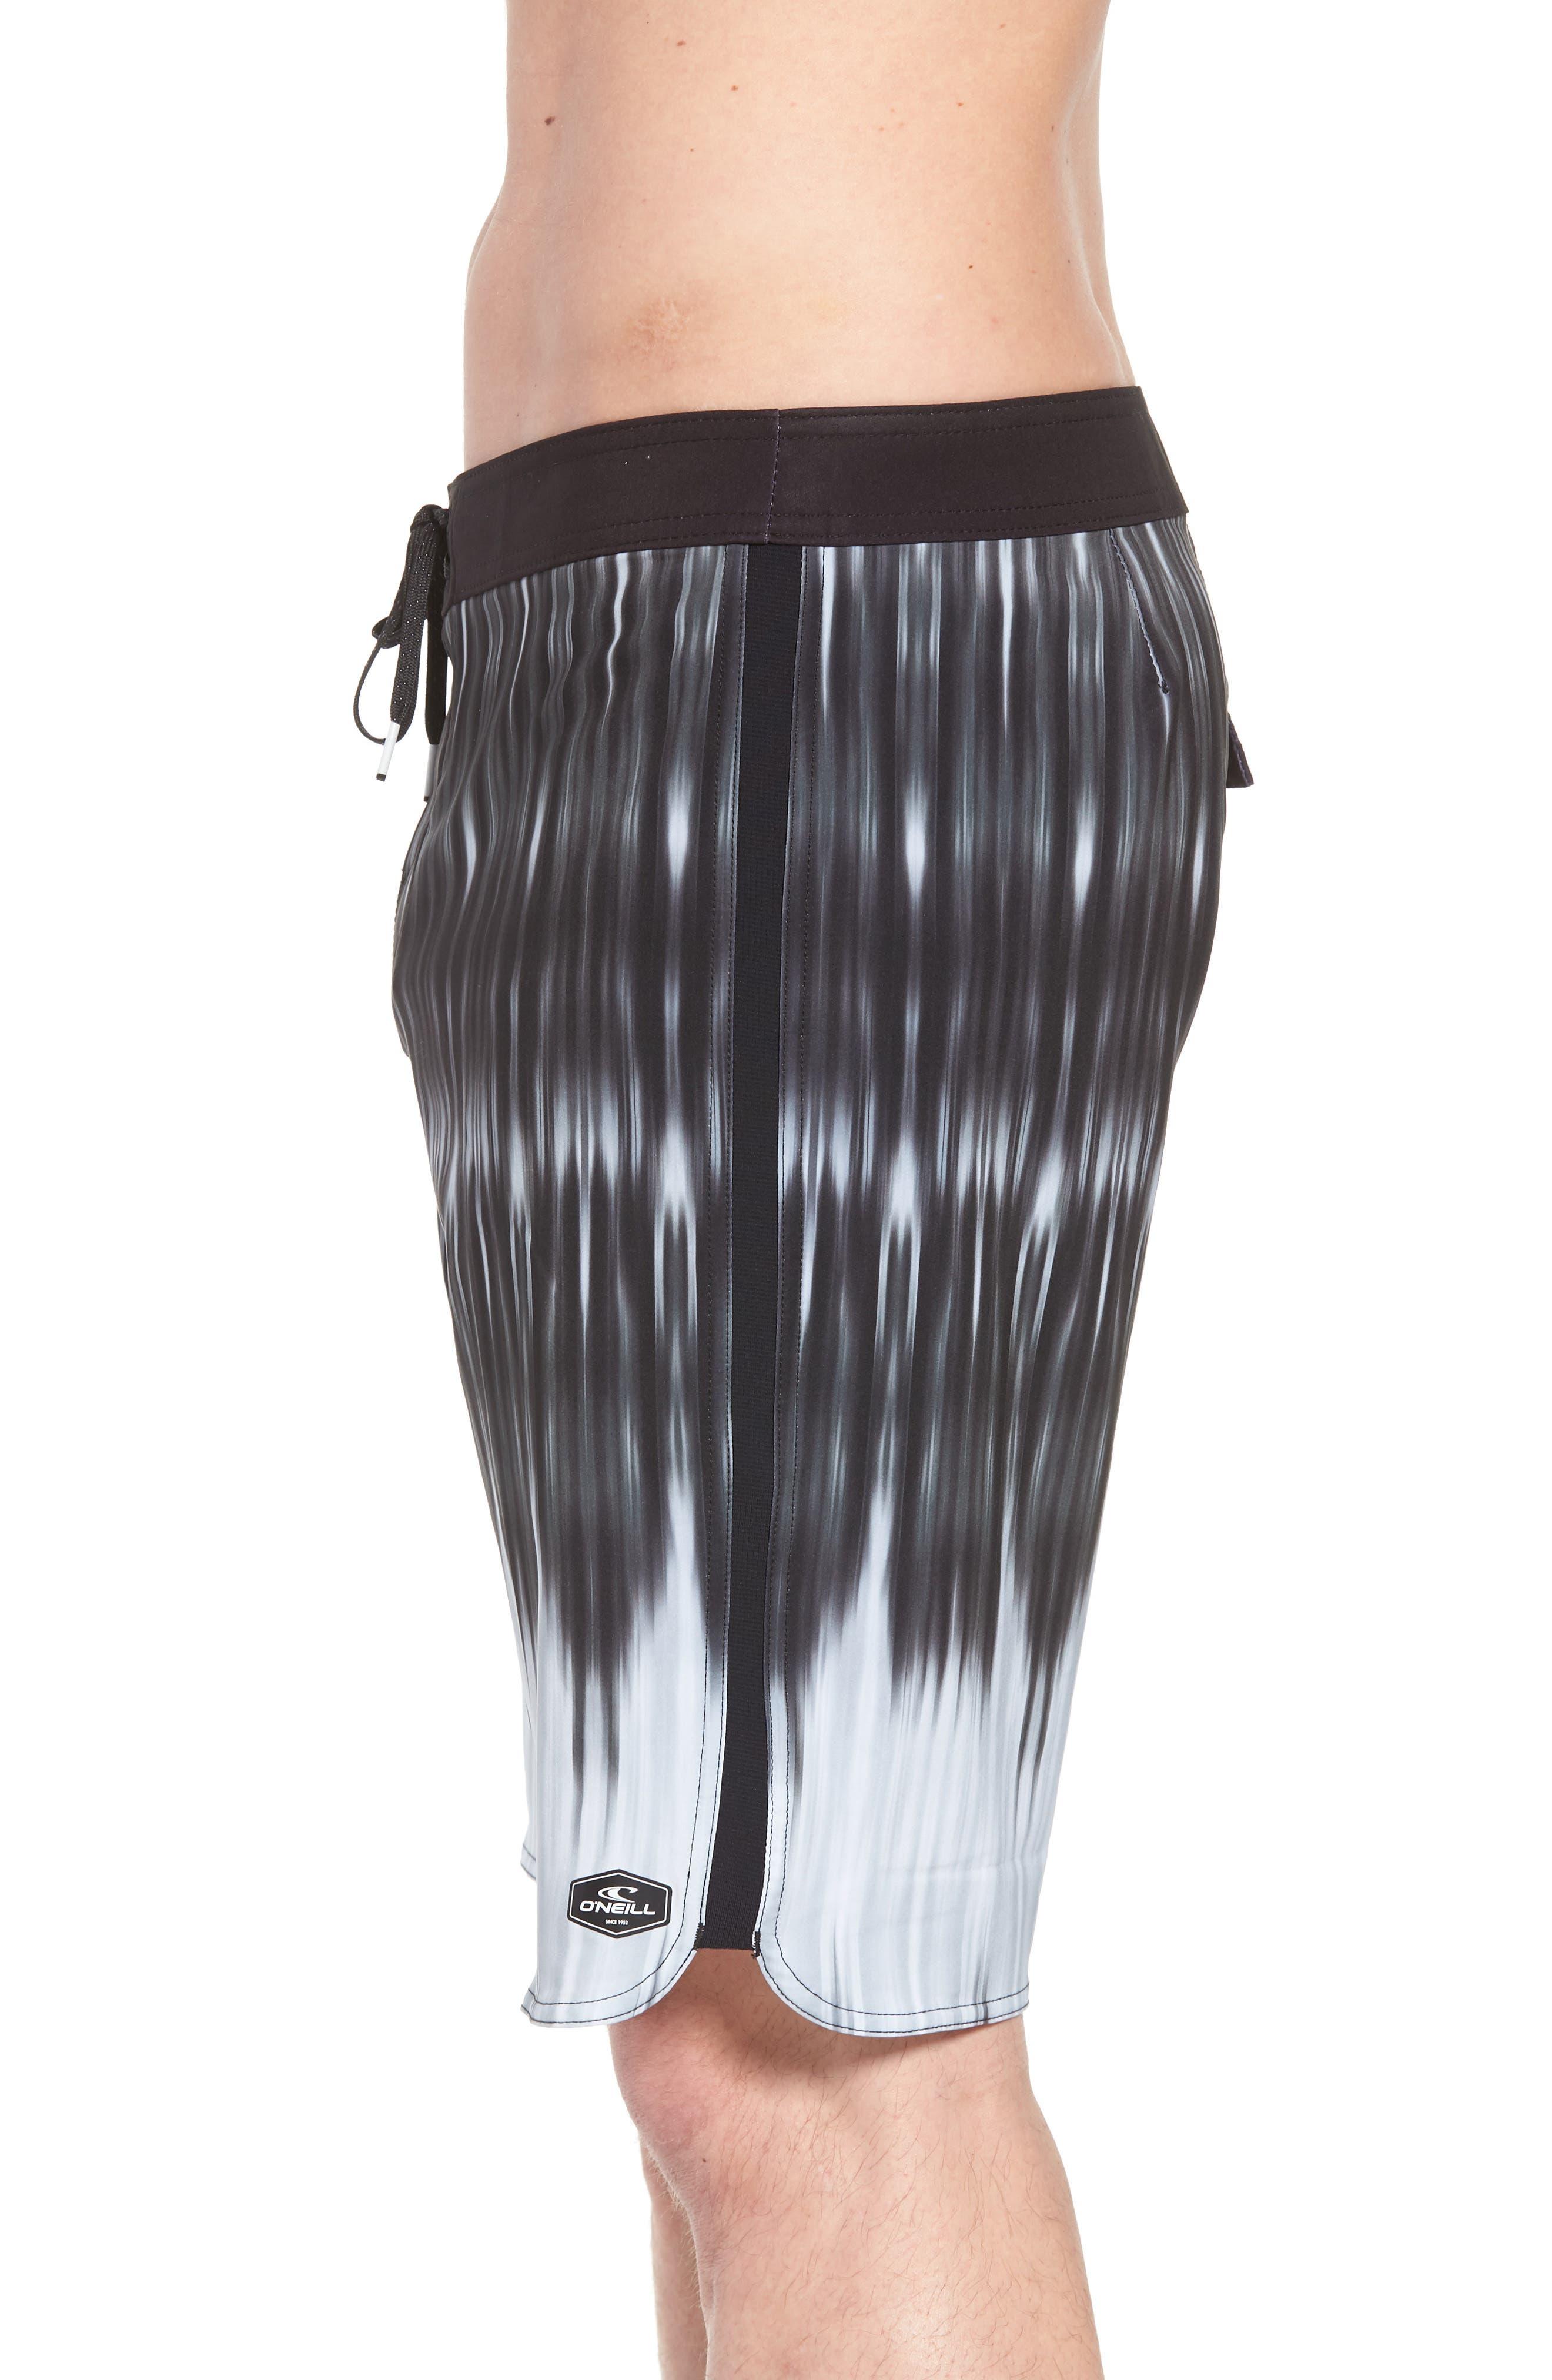 Superfreak Dimension Board Shorts,                             Alternate thumbnail 4, color,                             Black